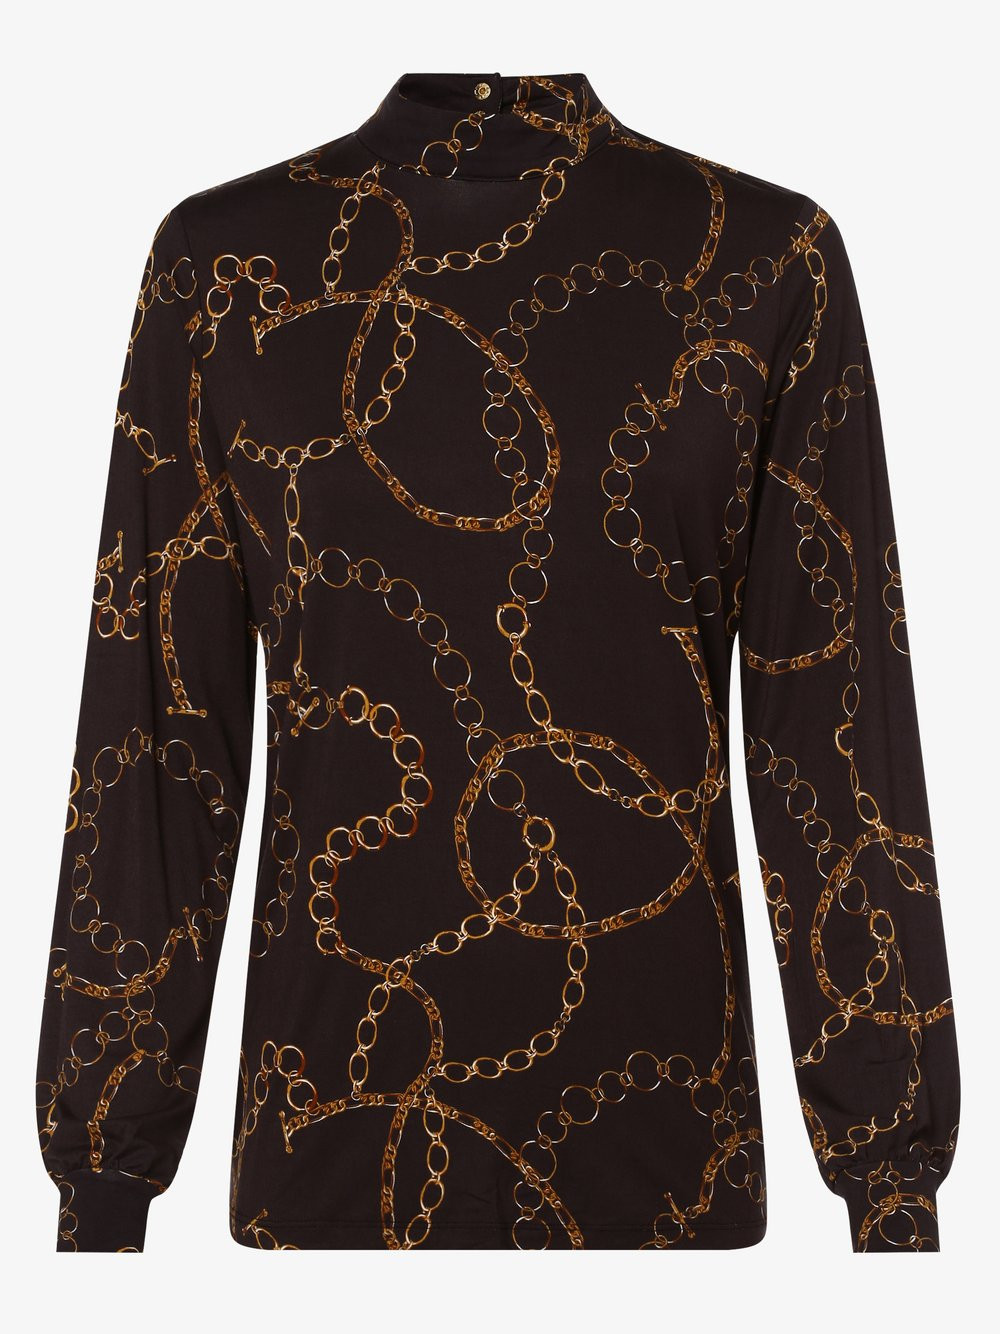 soyaconcept® – Damska koszulka z długim rękawem – Marica, szary Van Graaf 452755-0001-09970